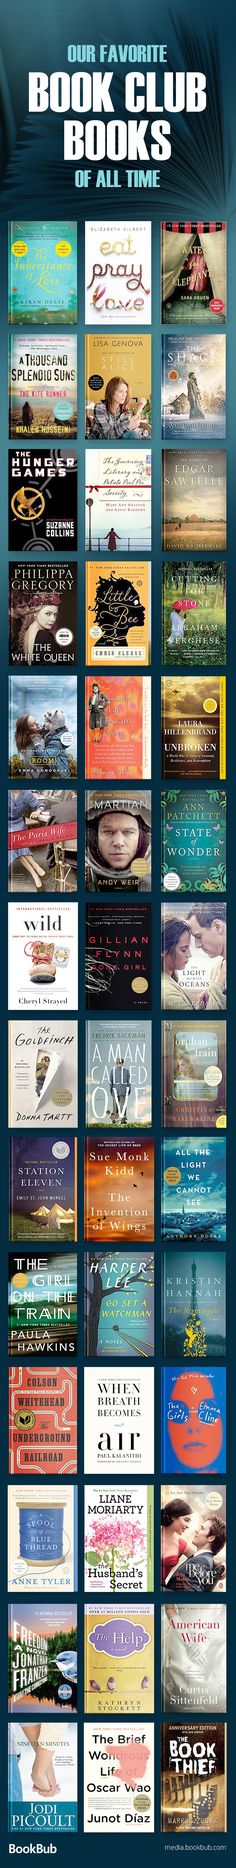 973 Best Books Books Books Images On Pinterest In 2018 Baby Books